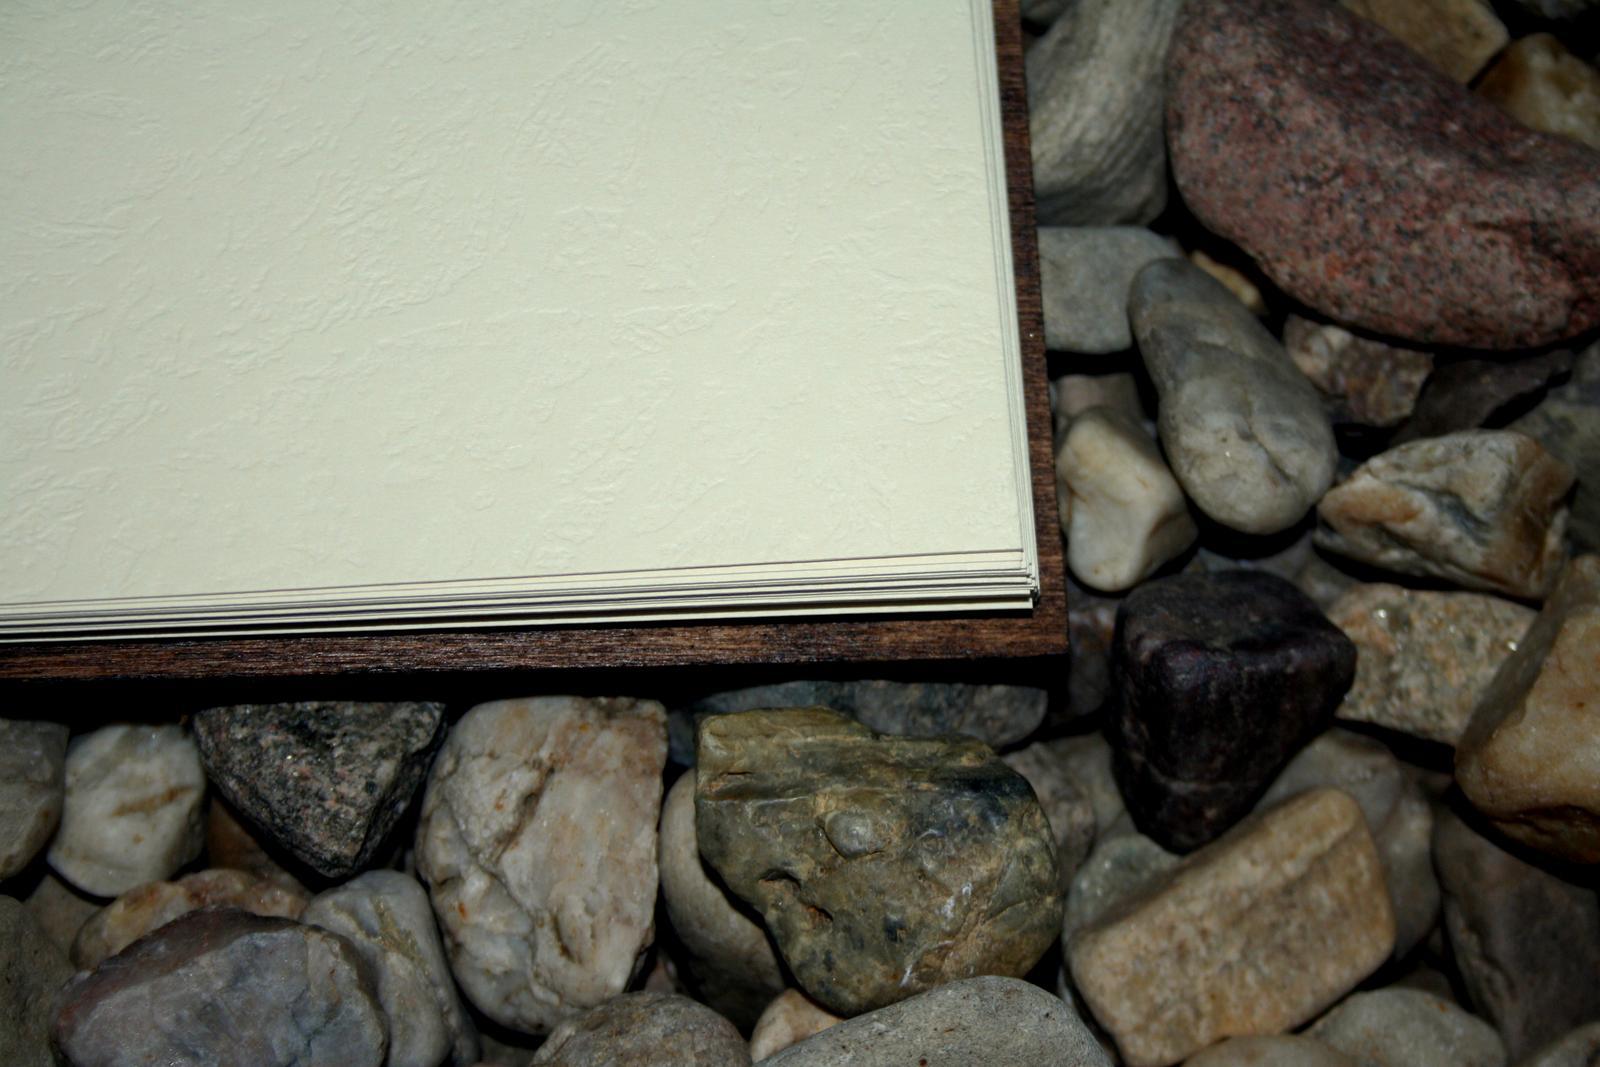 Svatební fotoalbum 35 listů - Obrázek č. 3